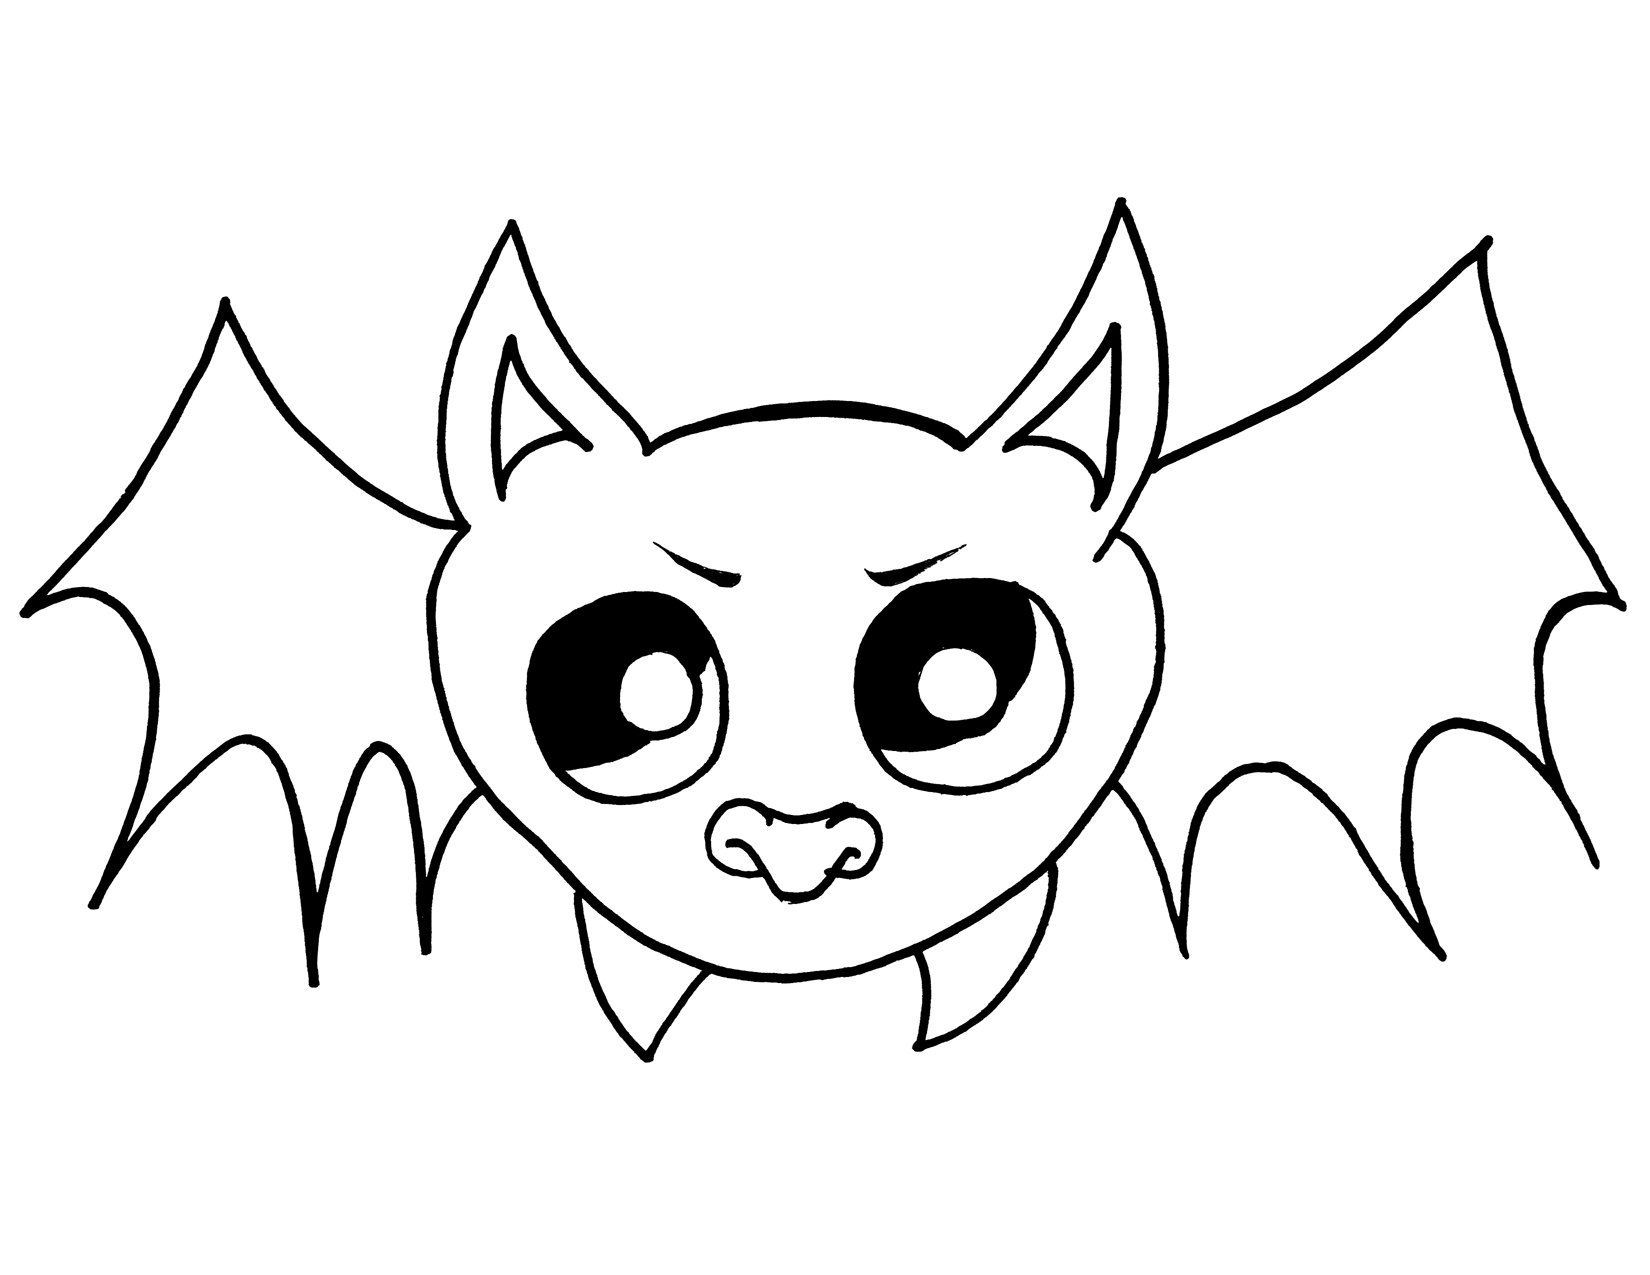 1650x1275 Drawing Bats For Halloween Fun For Christmas